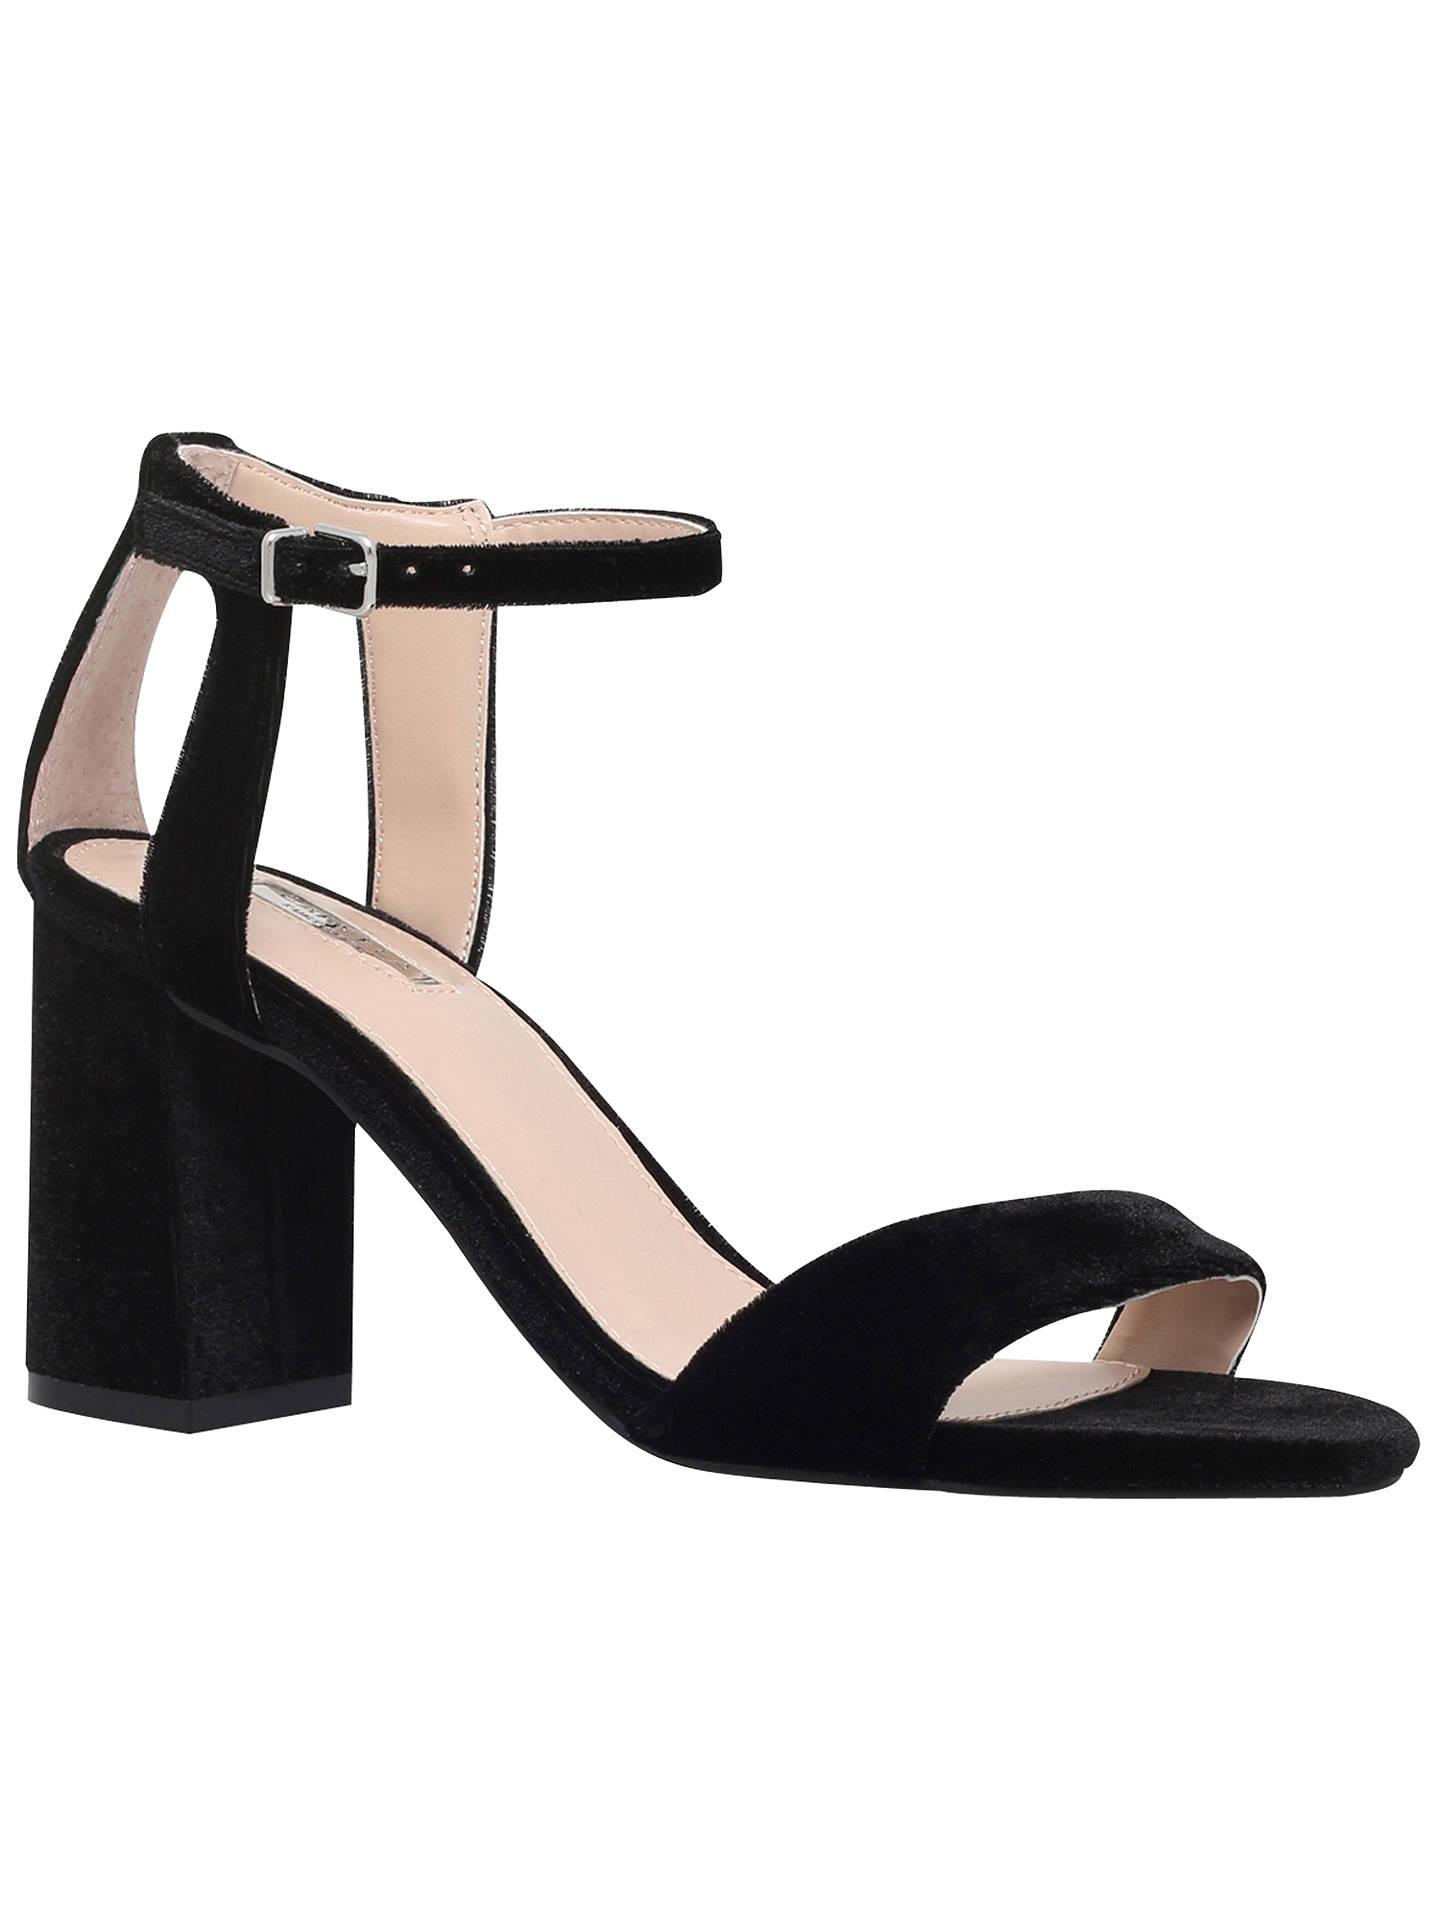 a9e26cb60fd Carvela Gigi Block Heeled Sandals at John Lewis   Partners